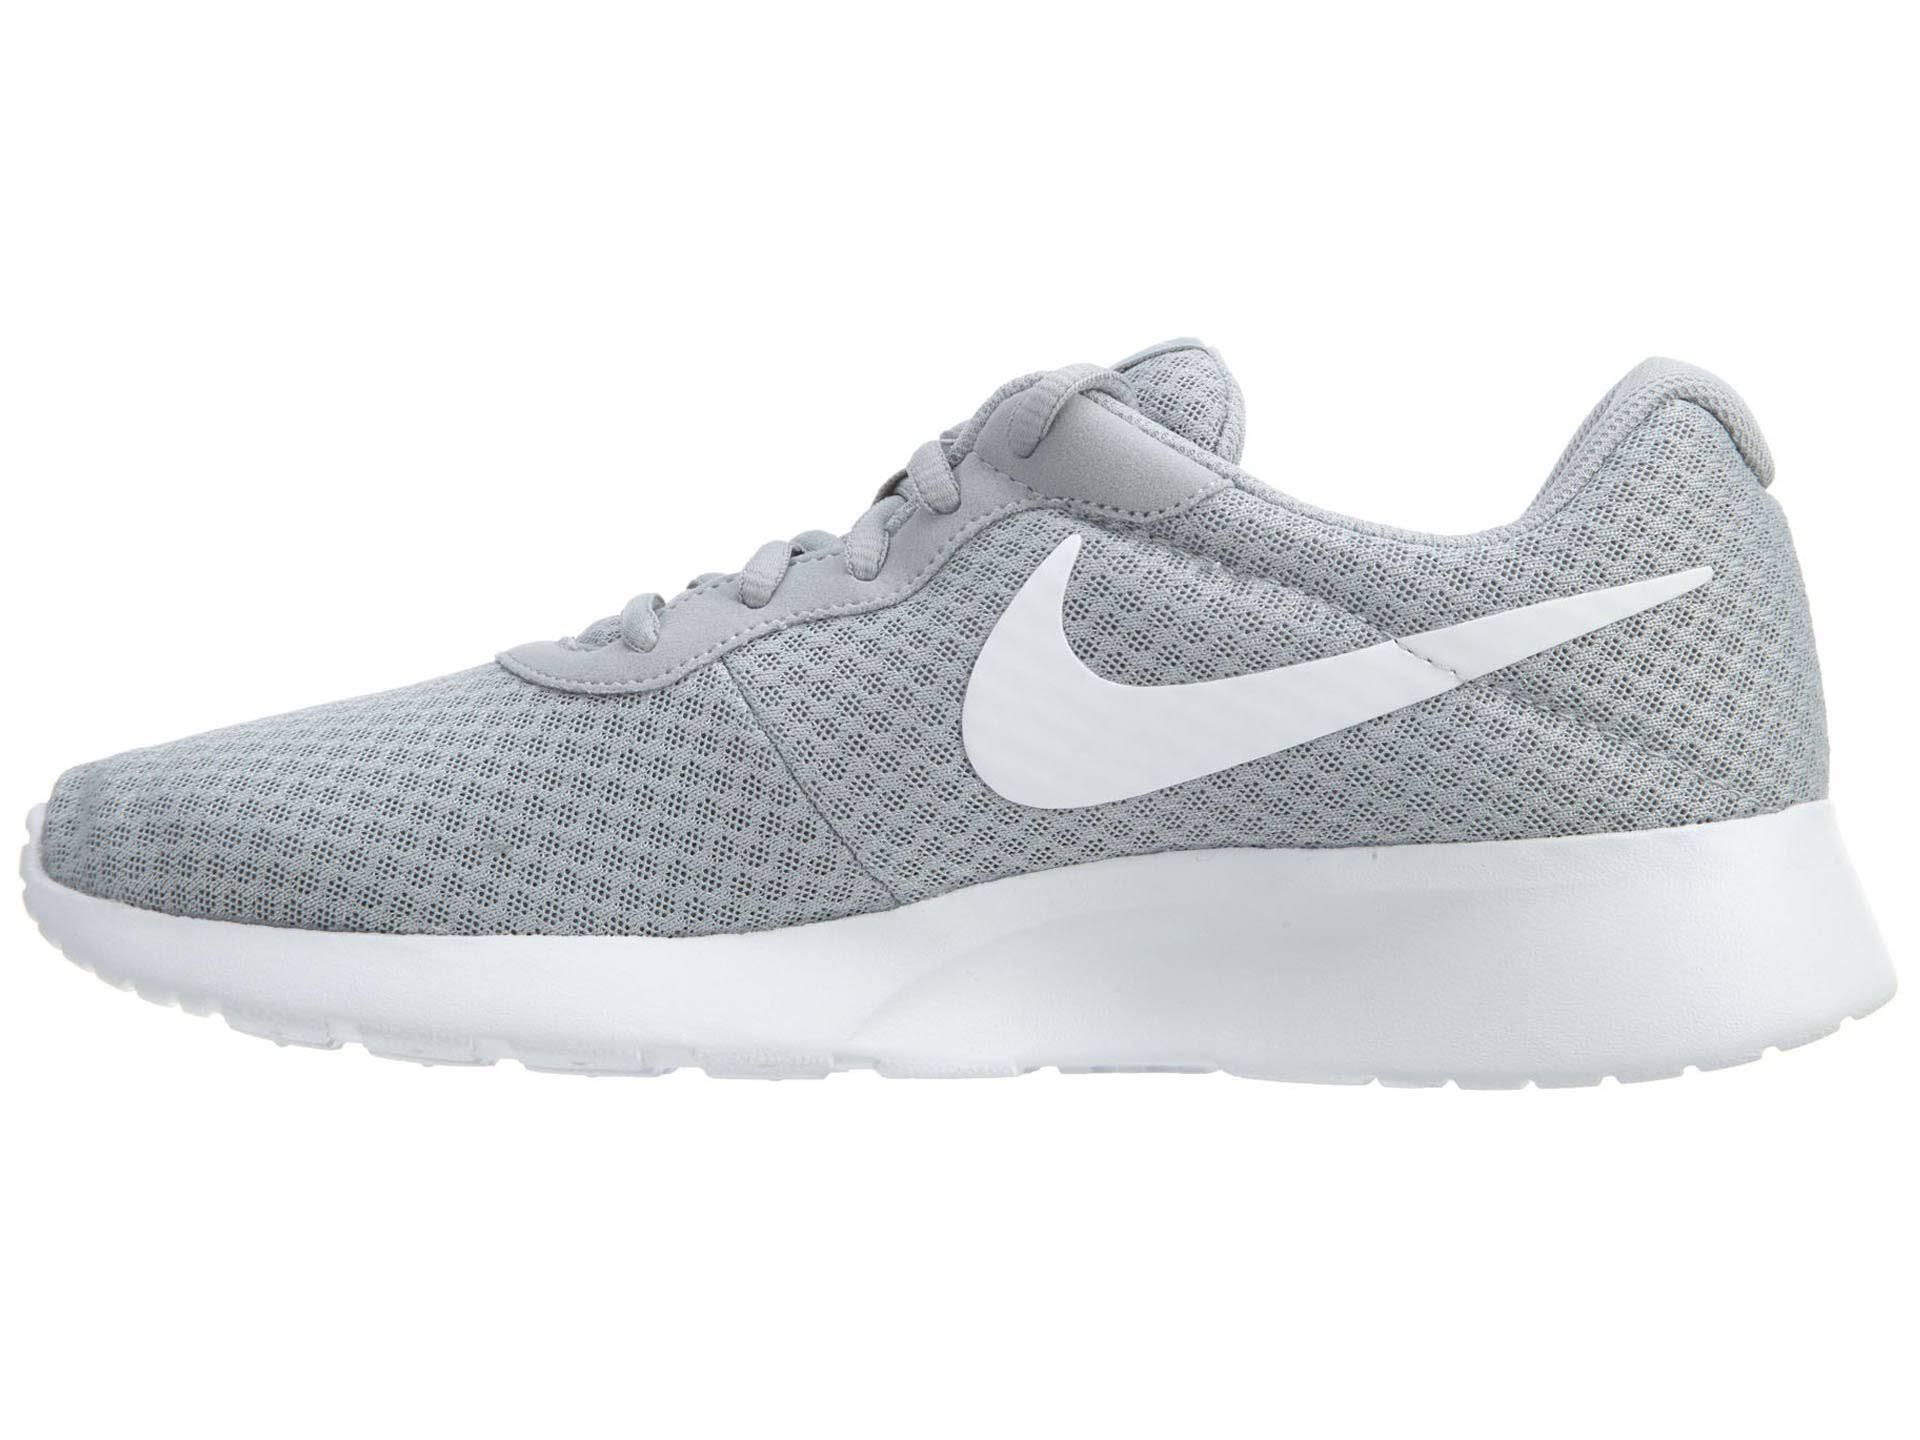 Heren Wolf Nike grijswit11 grijswit Tanjunwolf 9eEHYW2DI